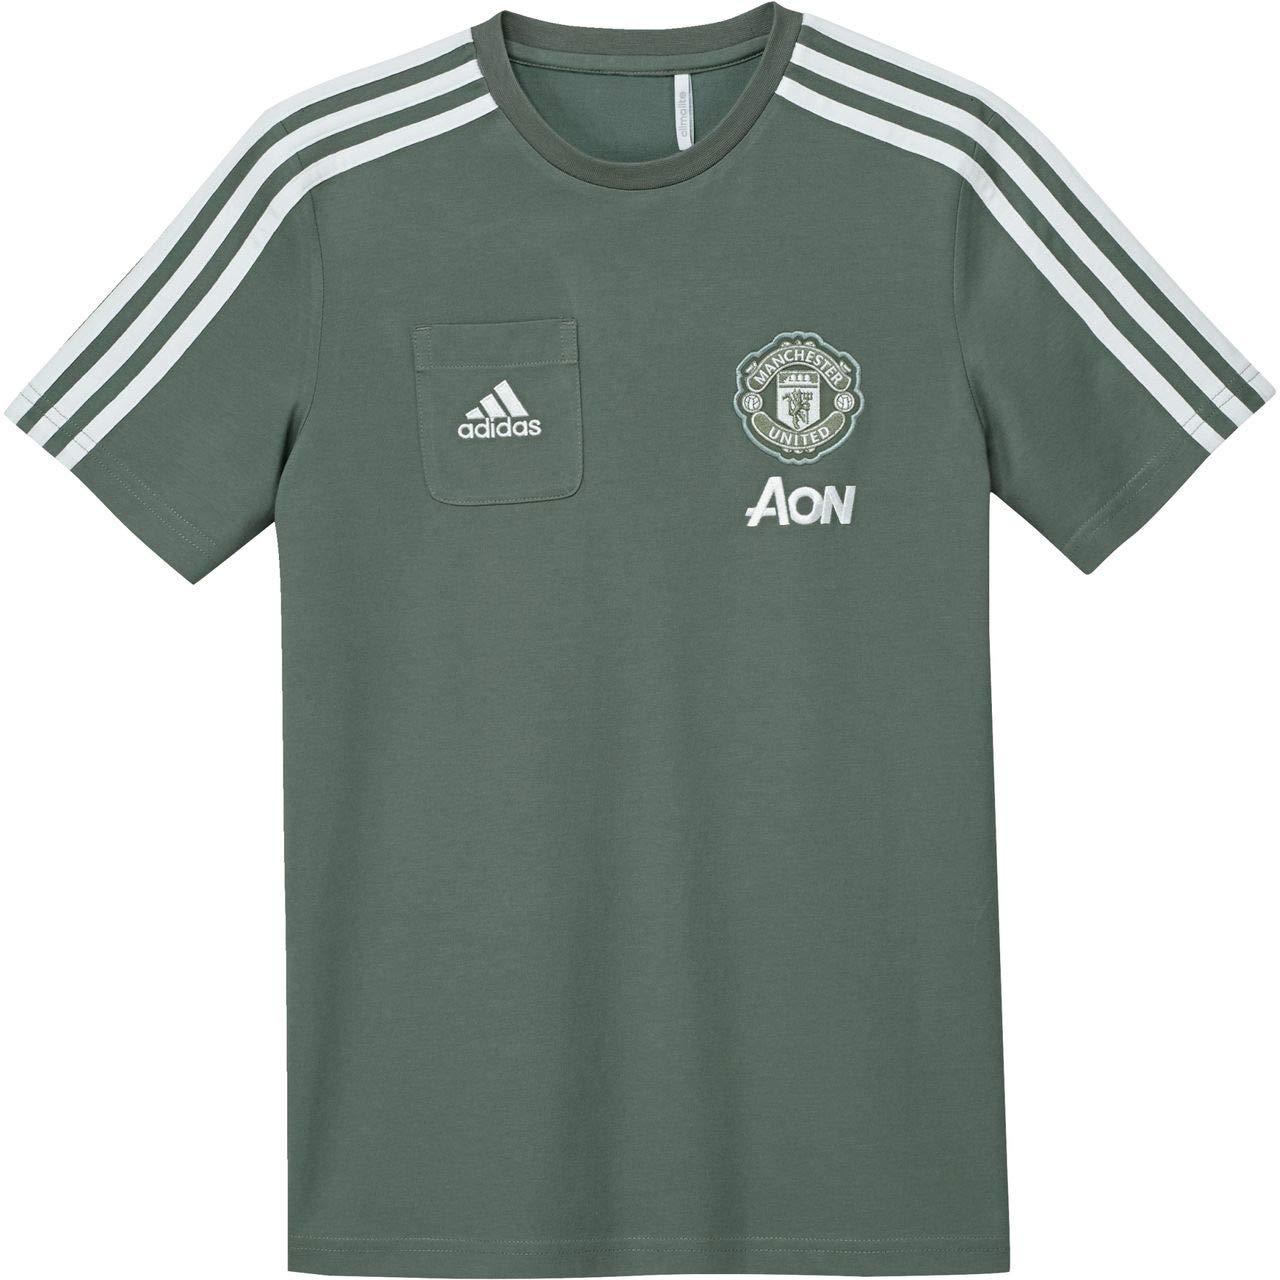 adidas Childrens Manchester United T-Shirt